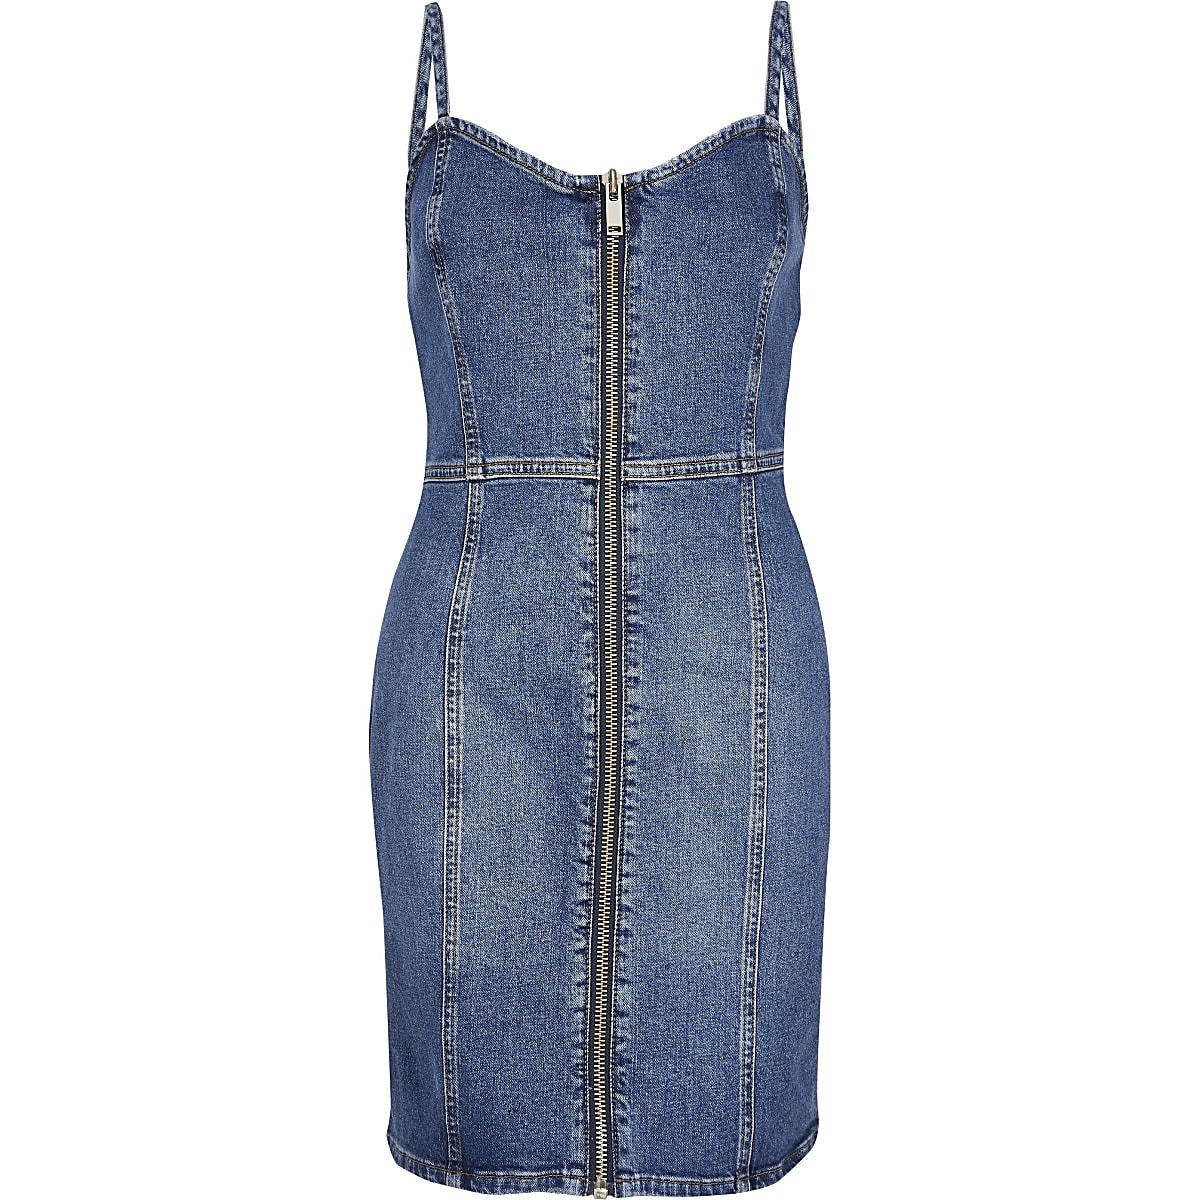 3c39bc14eaa Home · Women · Dresses  Mid blue denim pinafore dress. Mid blue denim  pinafore dress ...